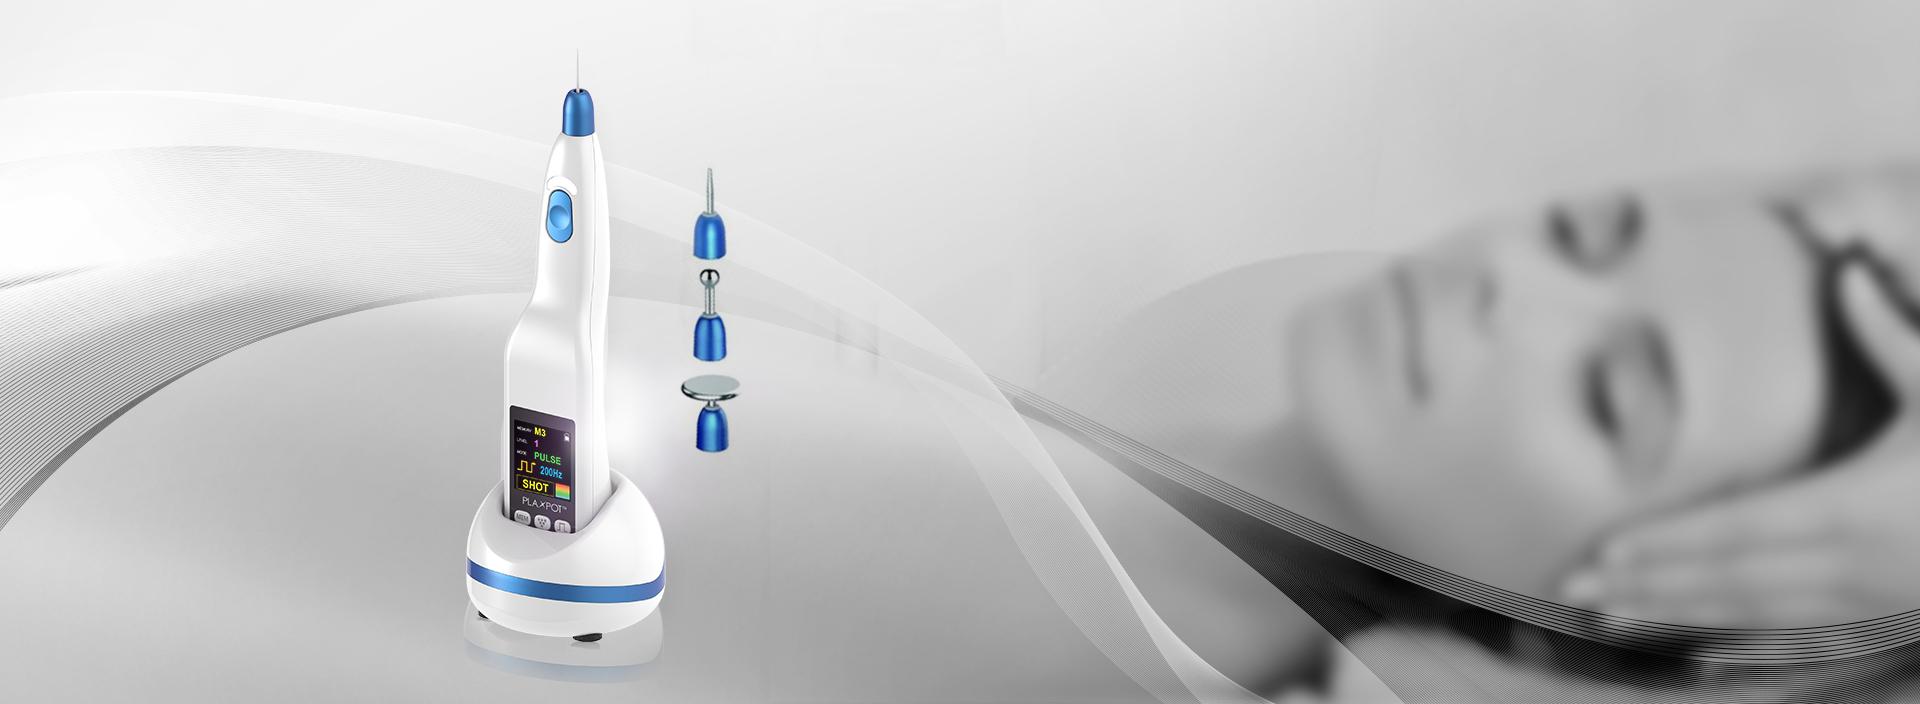 PLAXPOT PLASMA DEVICE - MEDICAL GRADE MULTI-PLASMA FLASH SKIN TIGHTENING TREATMENTS